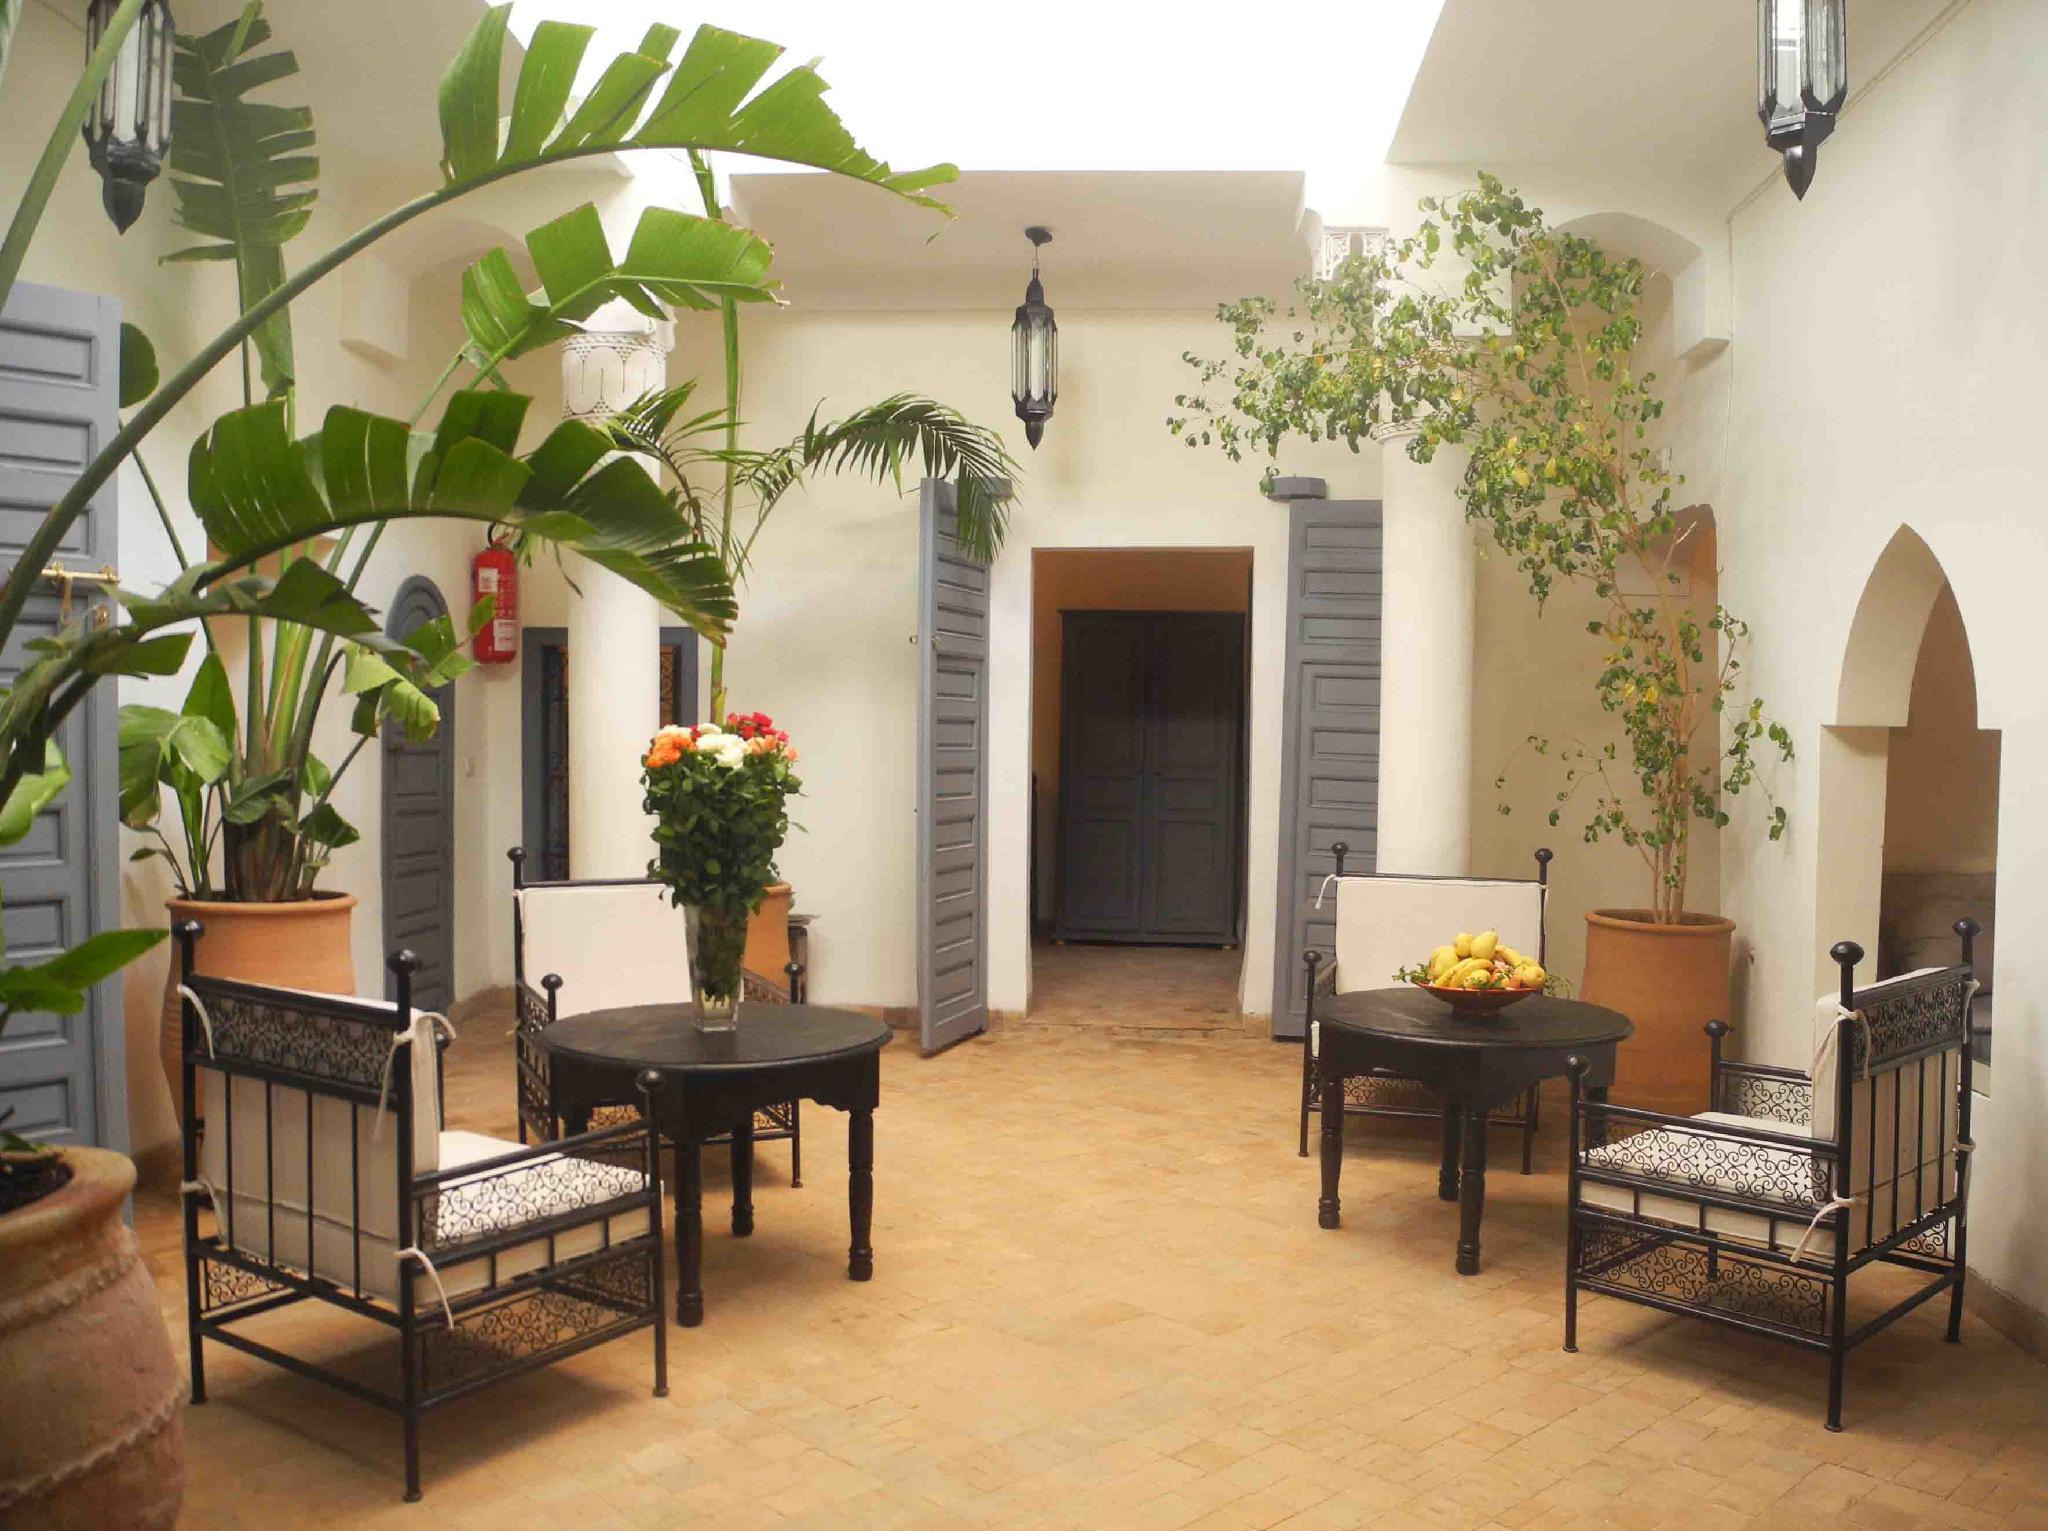 Riad Linda Marrakech - Rooftop Terrace